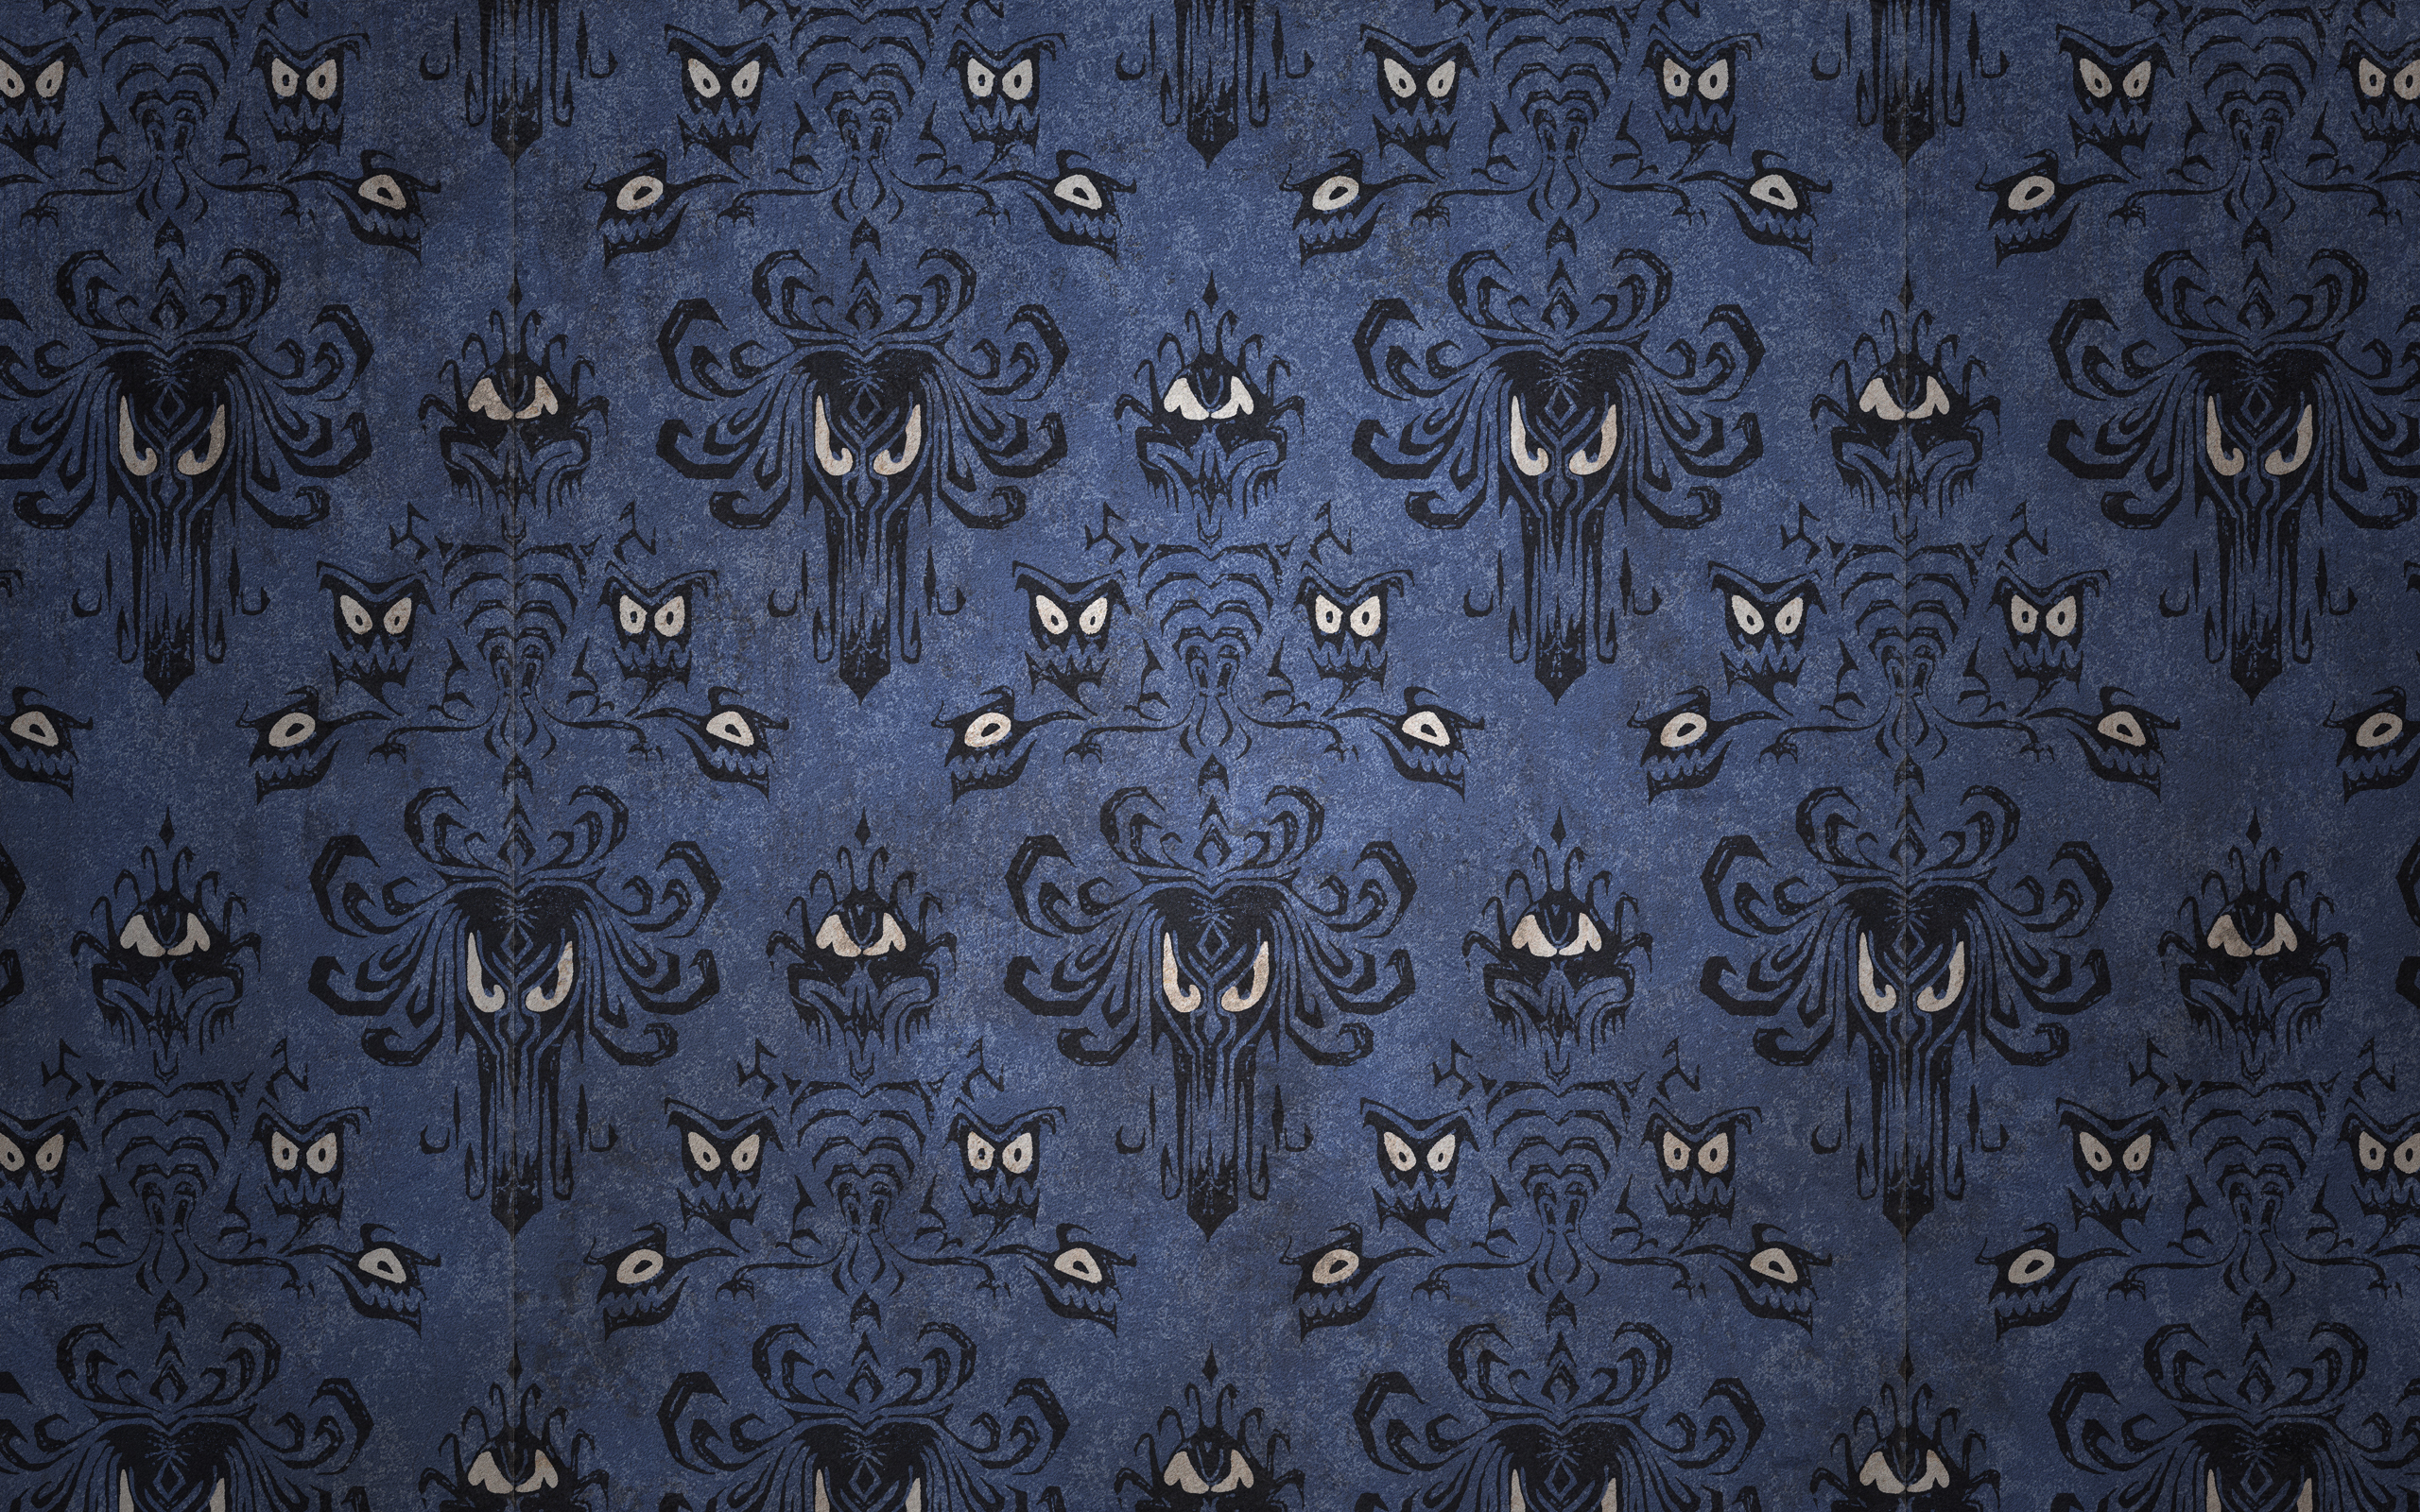 Haunted Mansion   Eerie Eyes by louiemantia 2560x1600